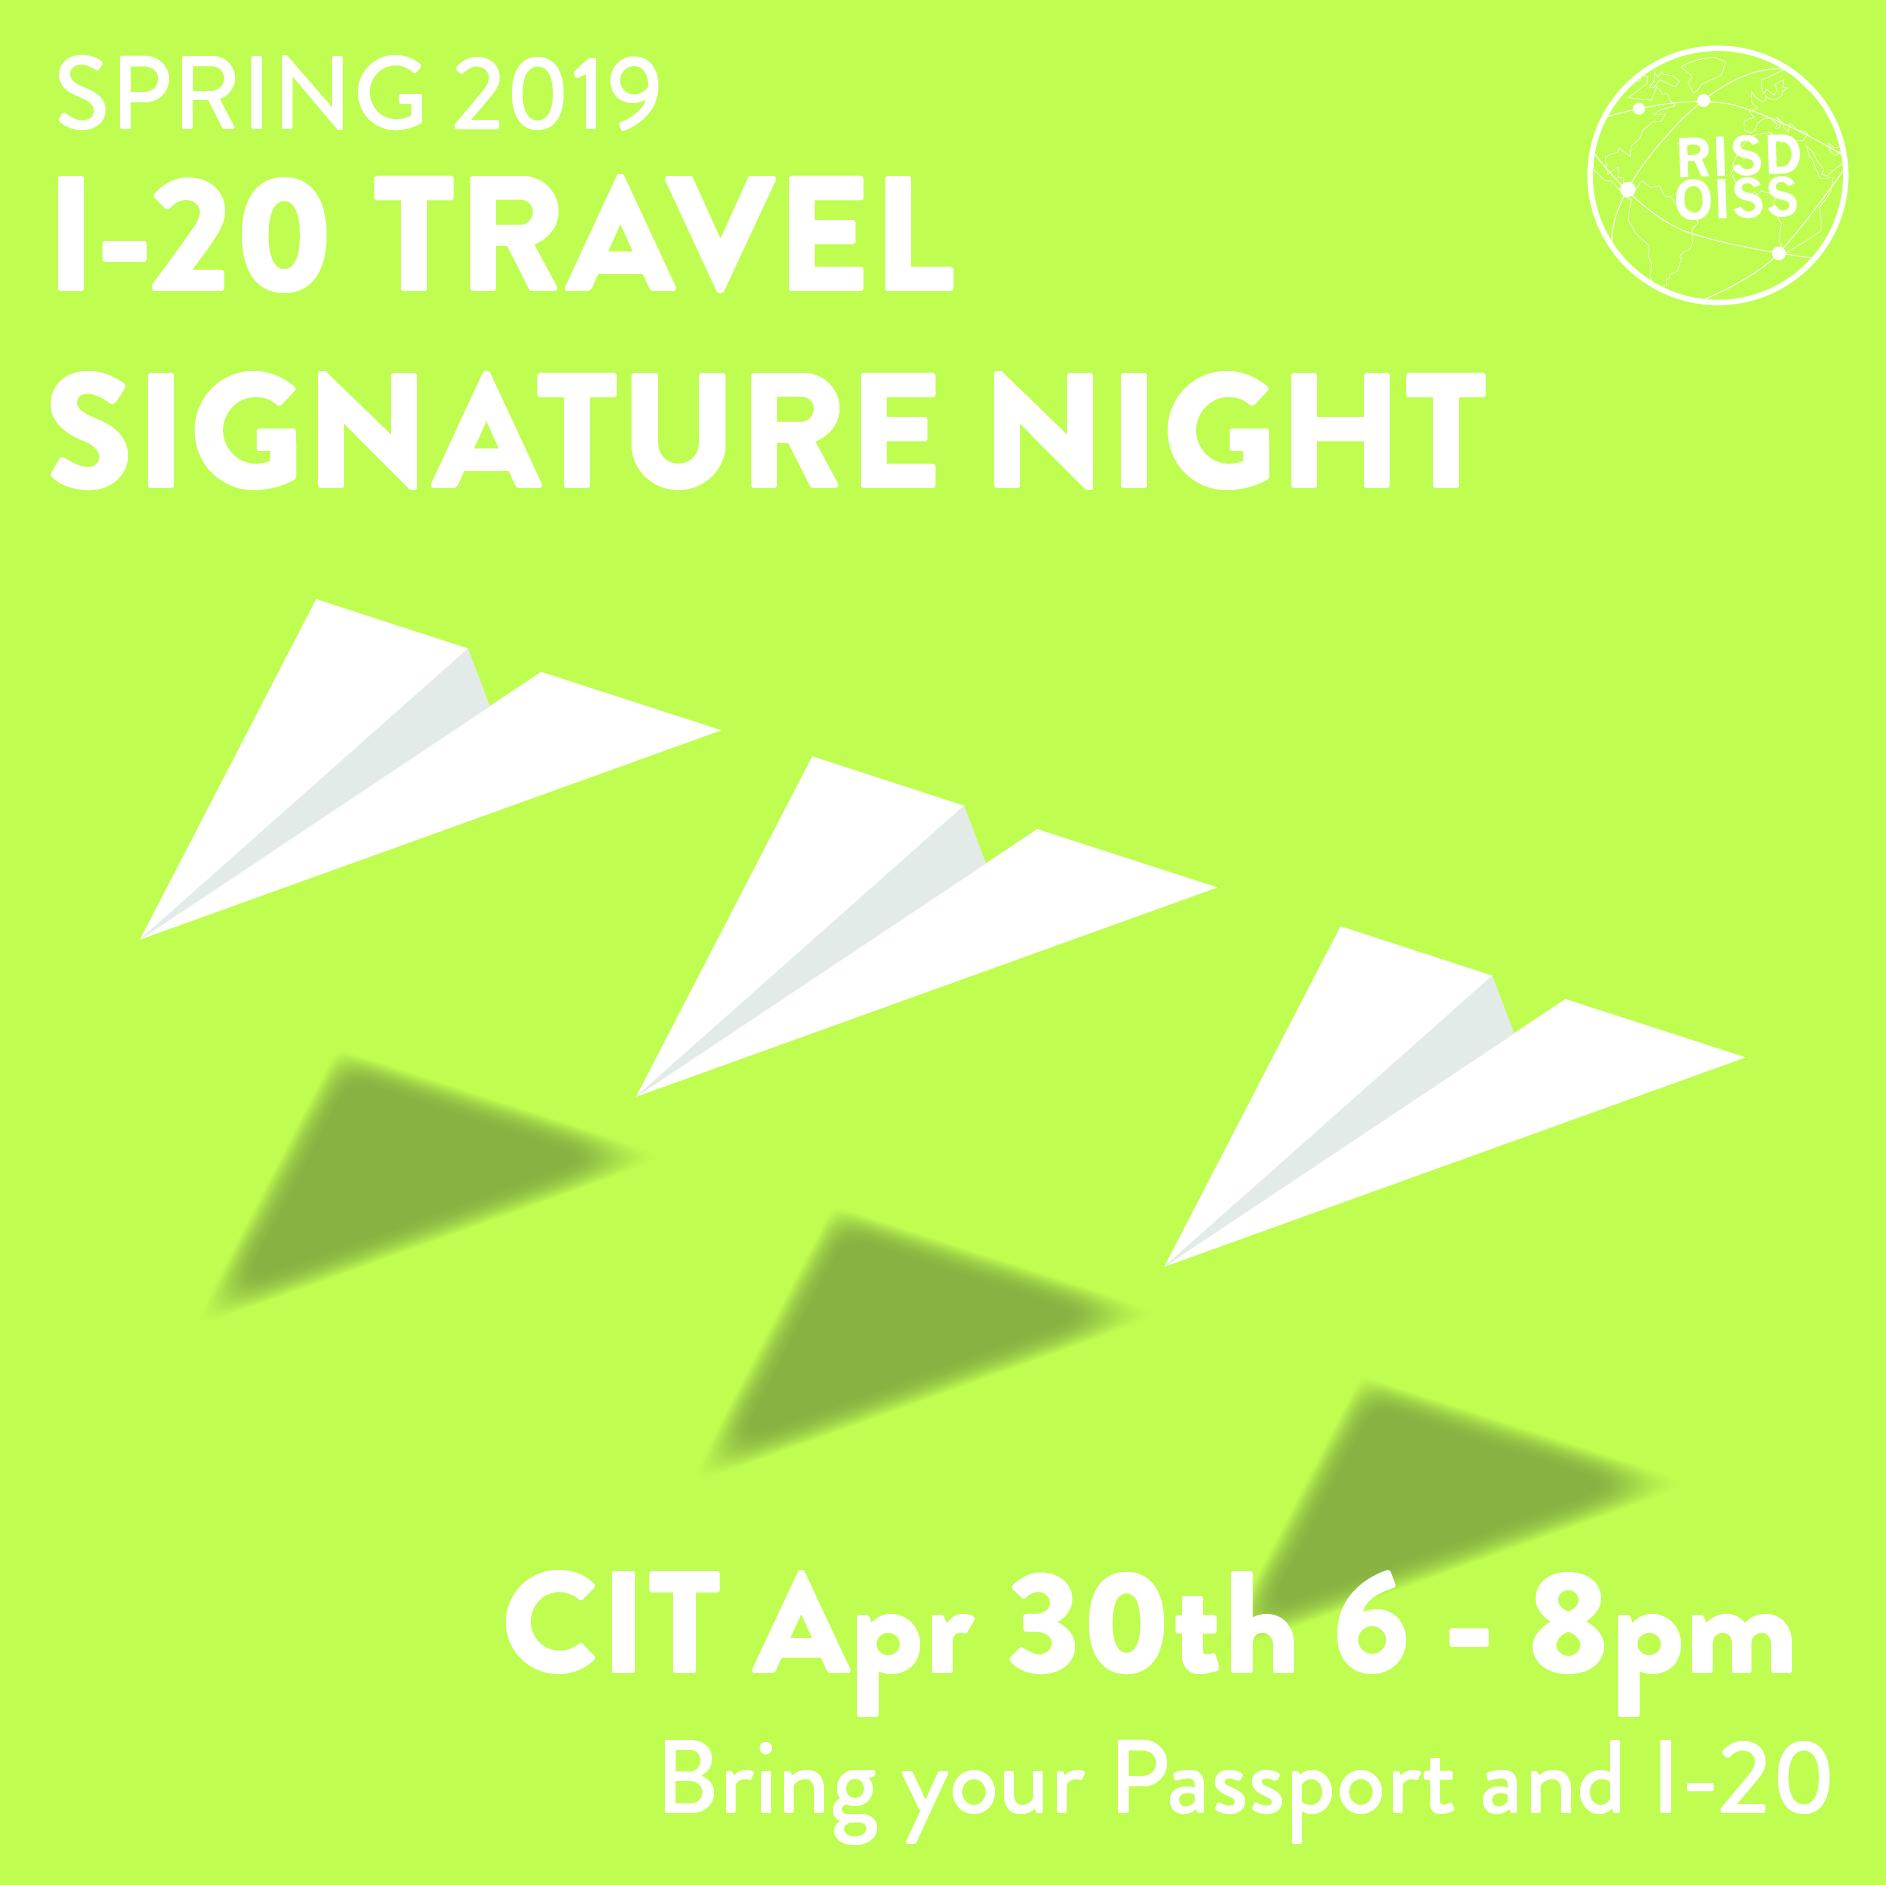 I-20 travel signature-11.jpg